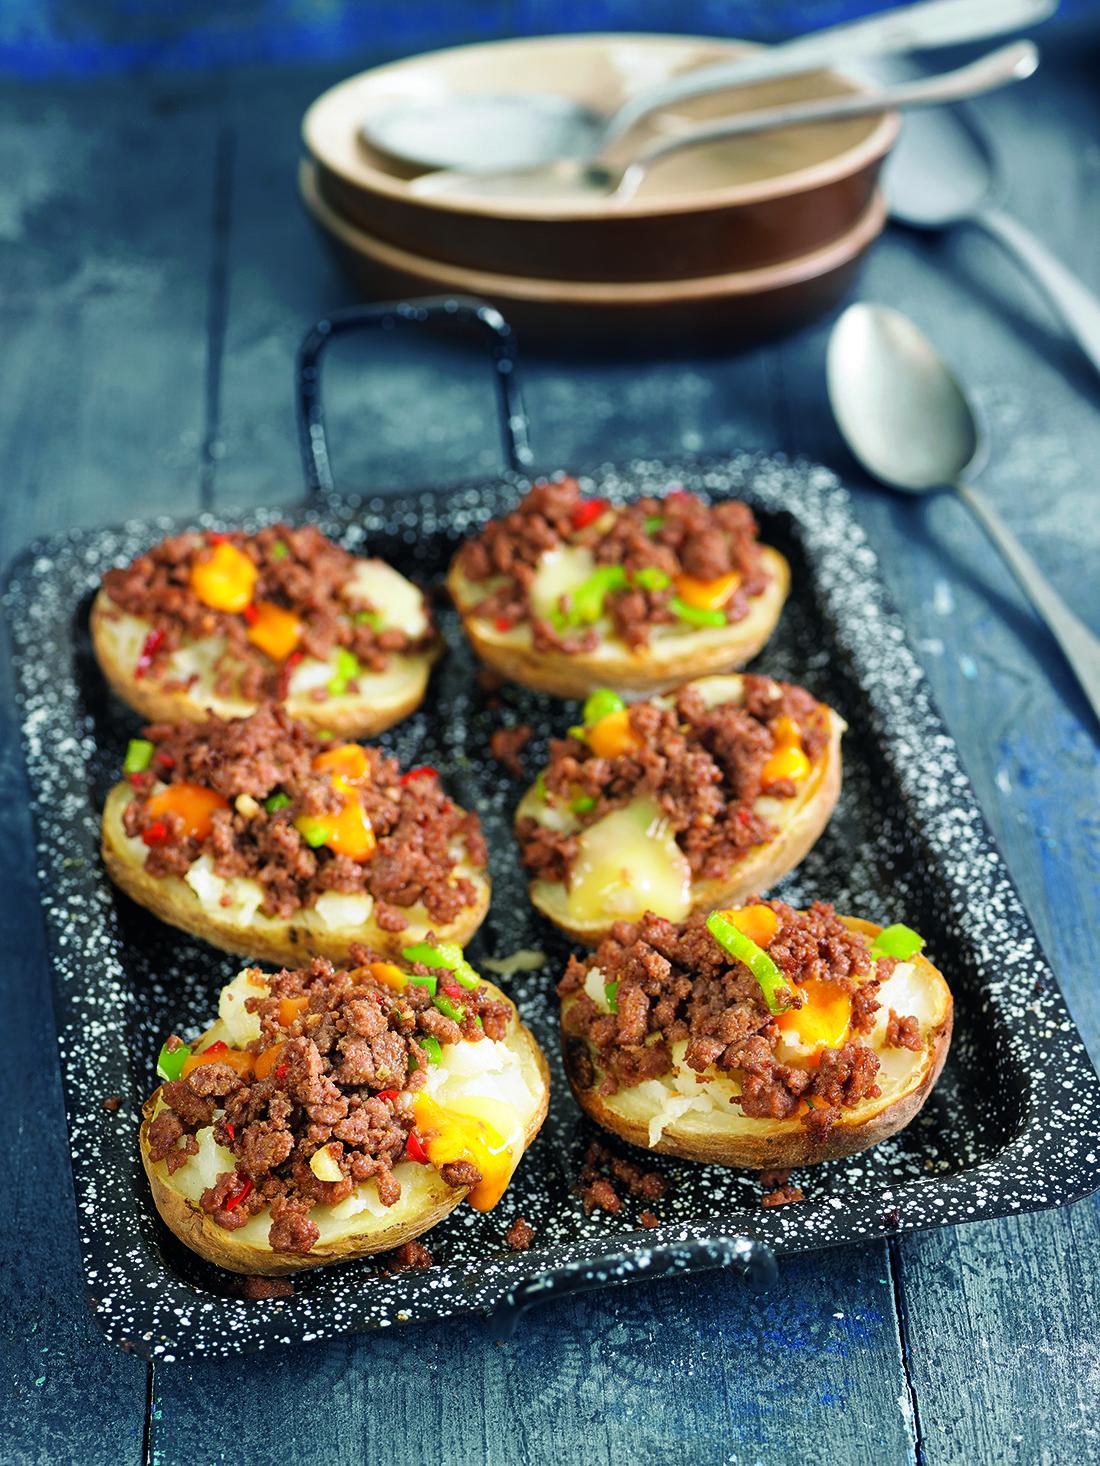 Patates rostides farcides amb carn picada